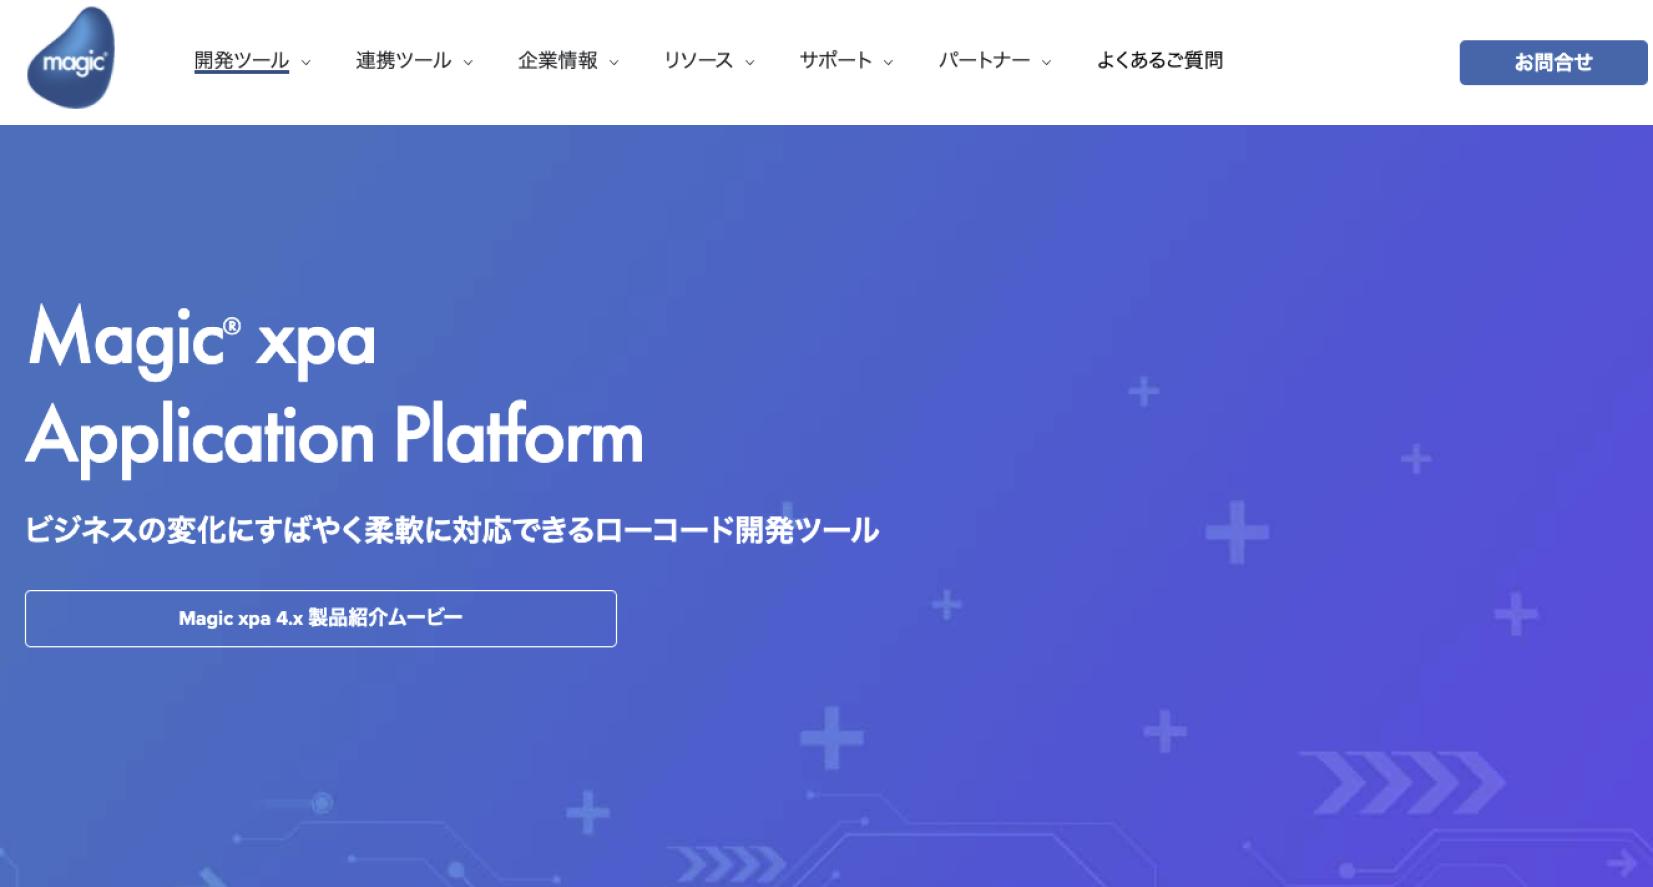 Magic xpa Application Platformのランディングページのスクリーンショット